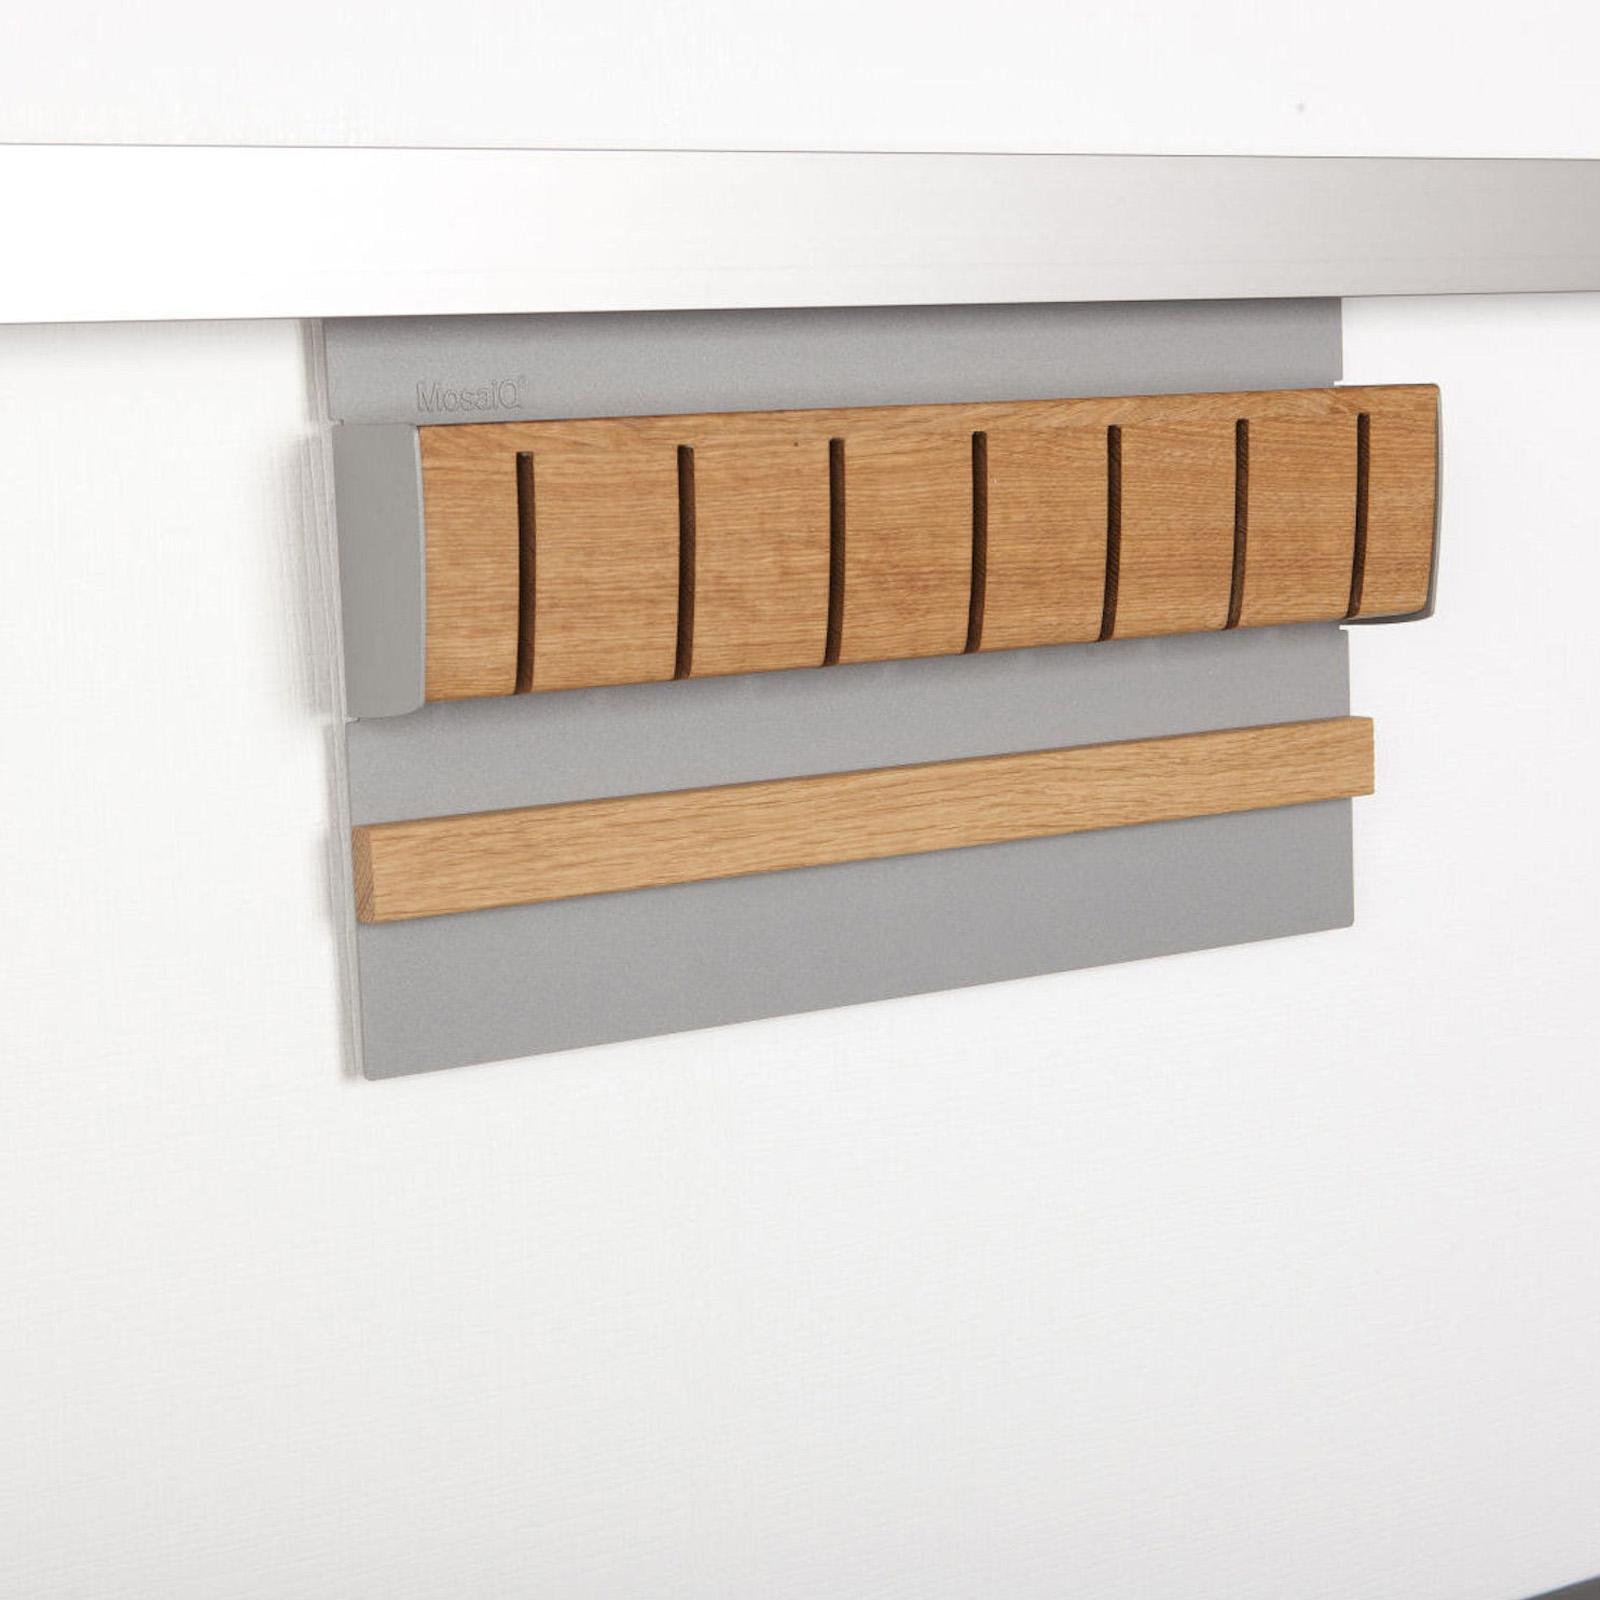 kesseb hmer linero mosaiq magnet messerhalter titan grau. Black Bedroom Furniture Sets. Home Design Ideas